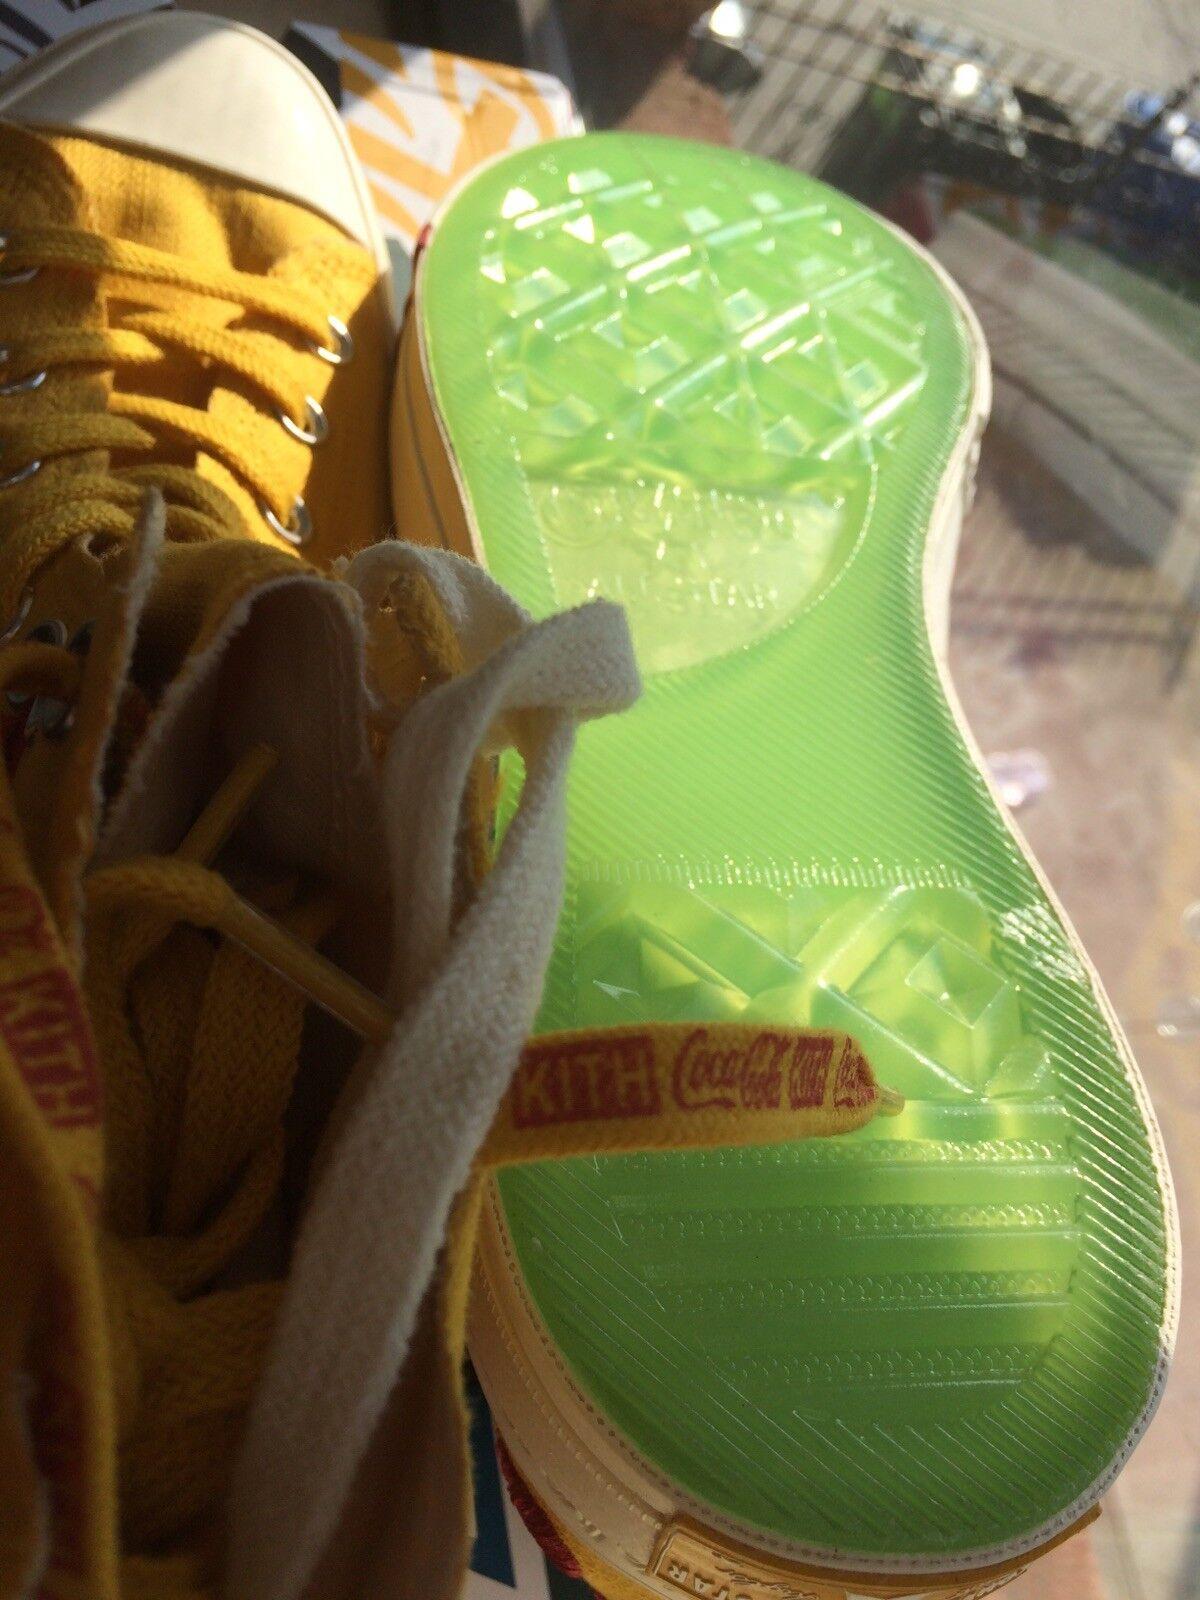 kith cola x coca - cola kith converse chuck taylor 70 chine jaune en main * limité taille 11 * c705c1